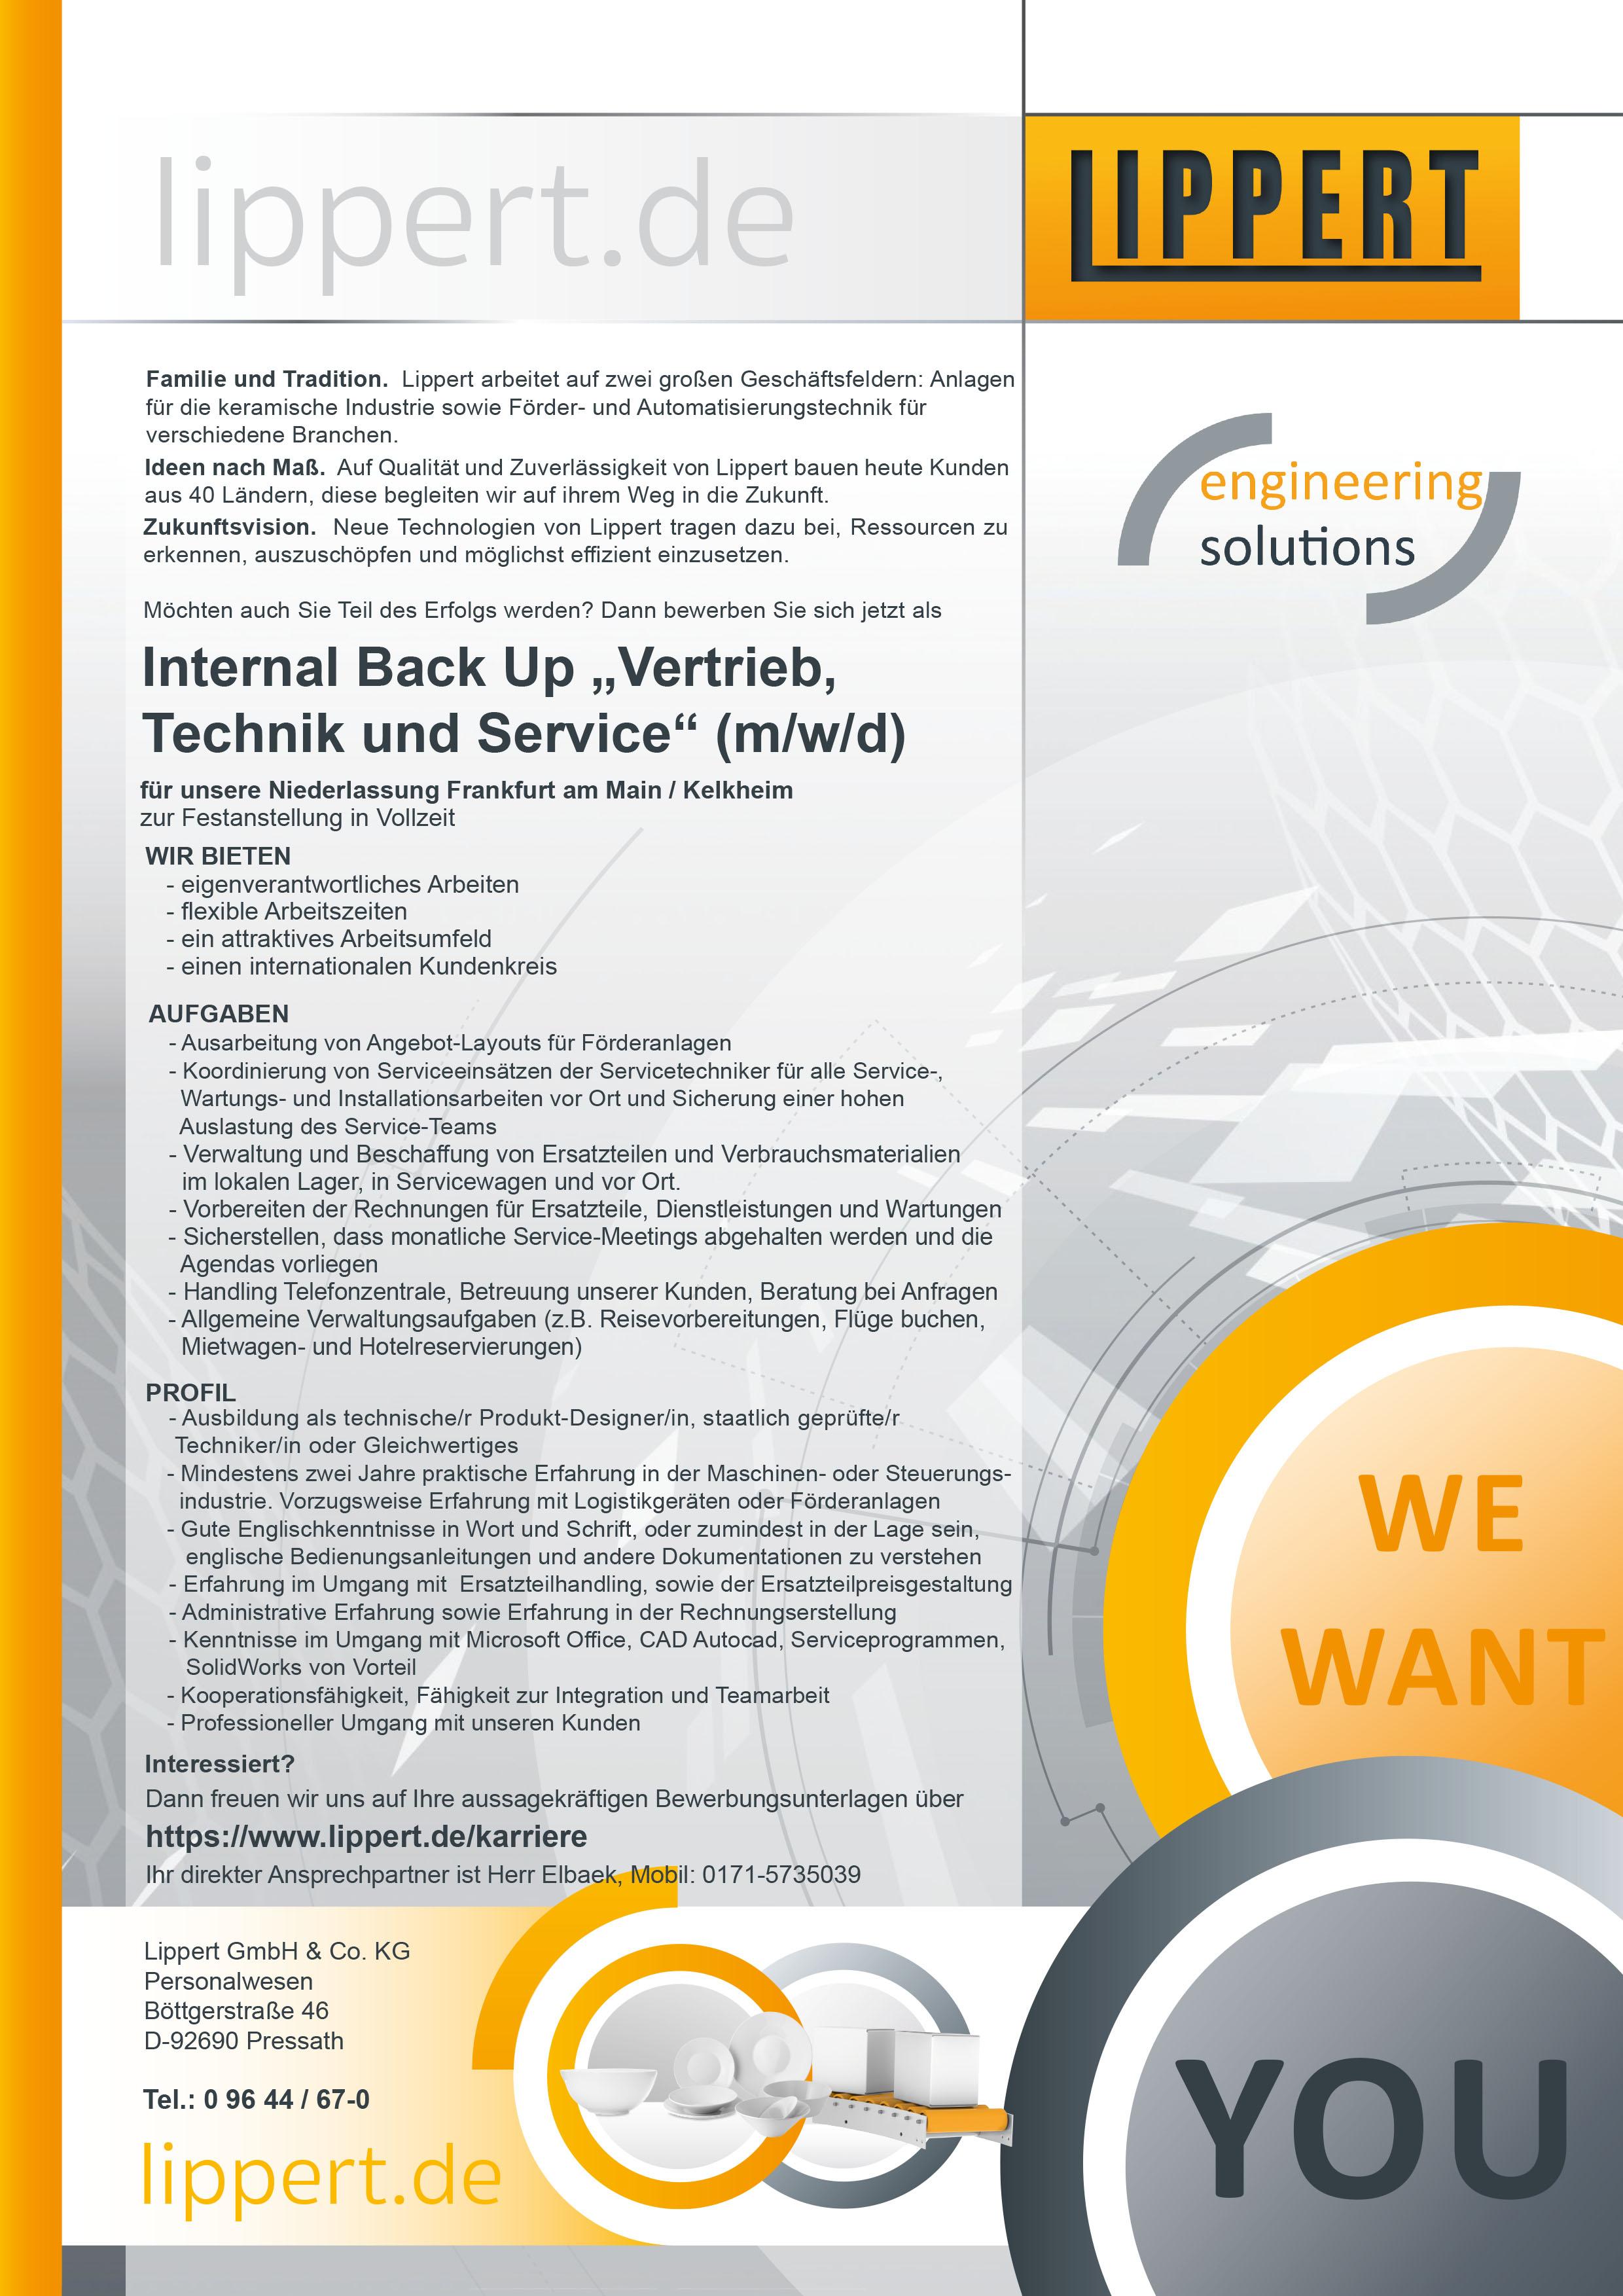 Internal Back Up